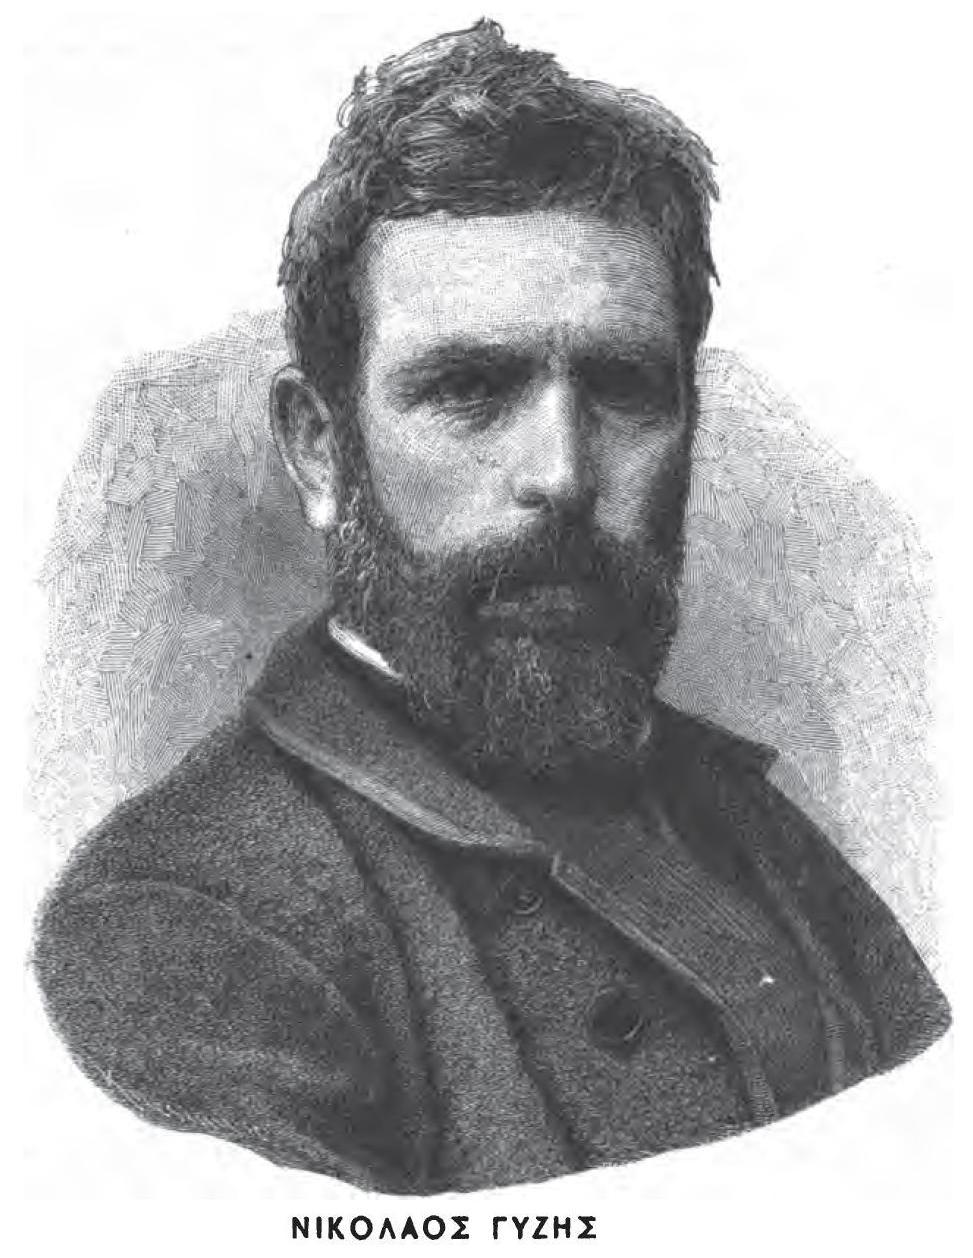 http://upload.wikimedia.org/wikipedia/commons/3/32/Nikolaos_Gyzis.JPG